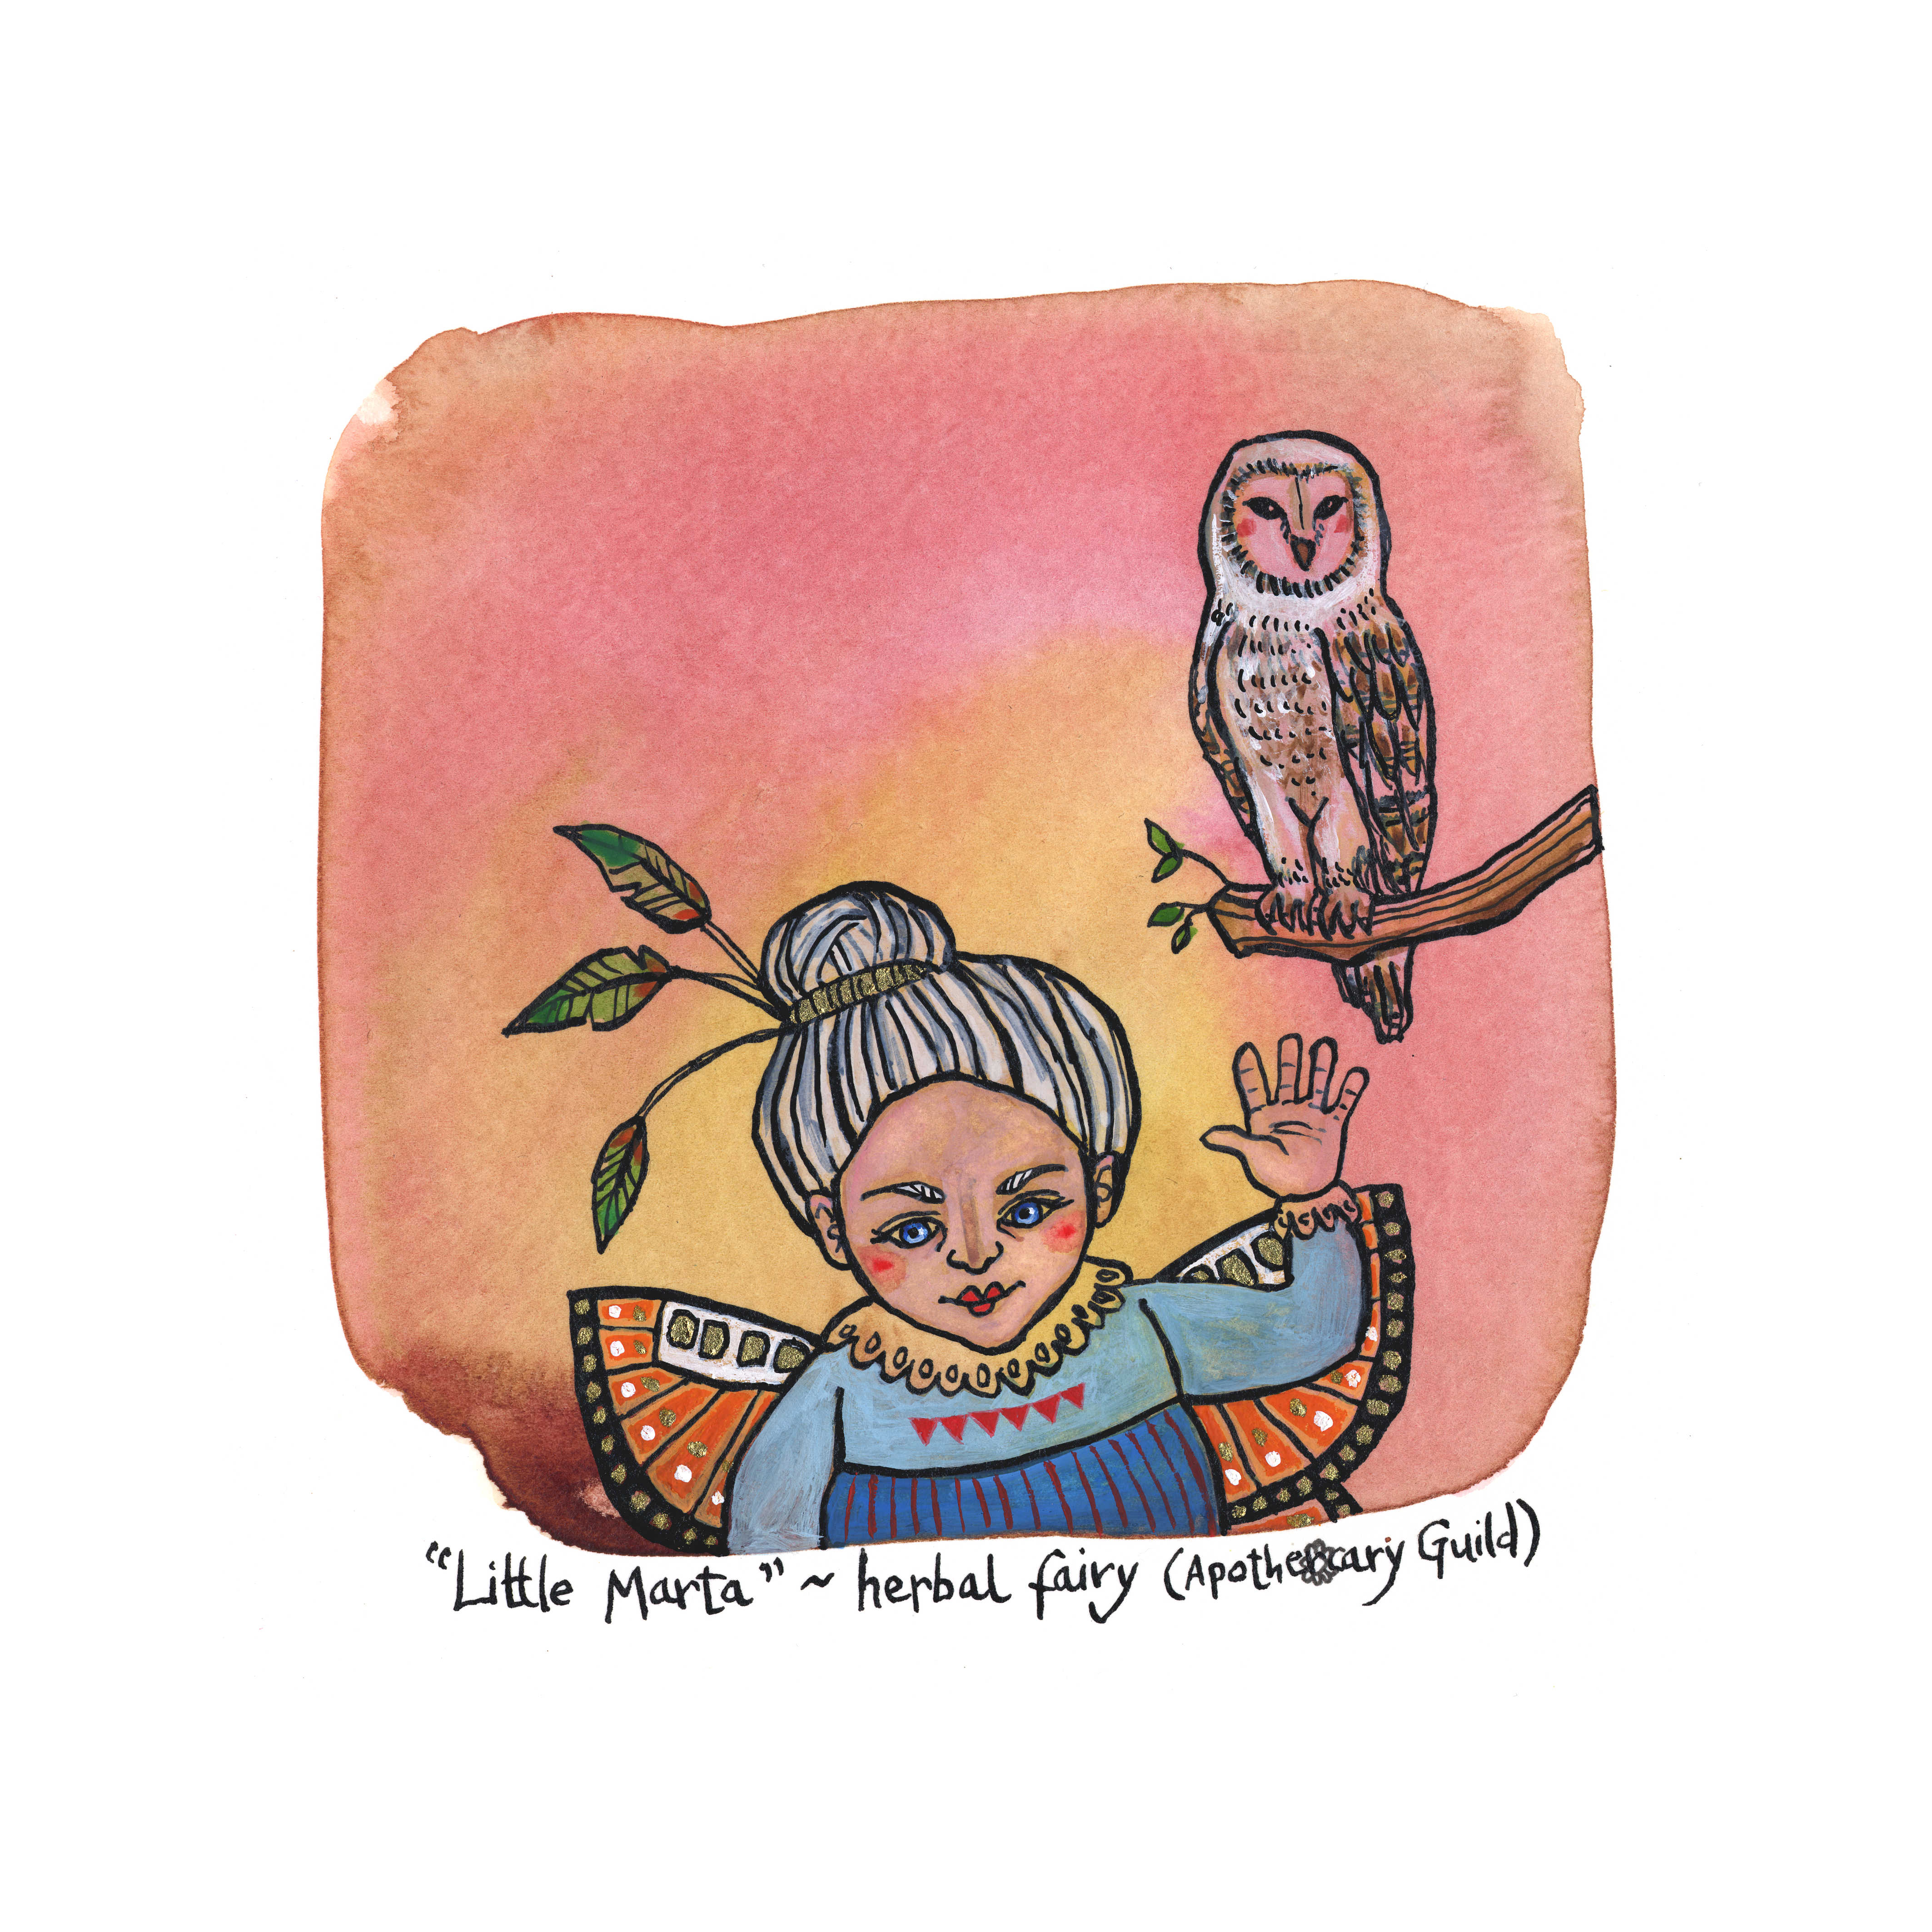 Little Marta - Herbal Fairy